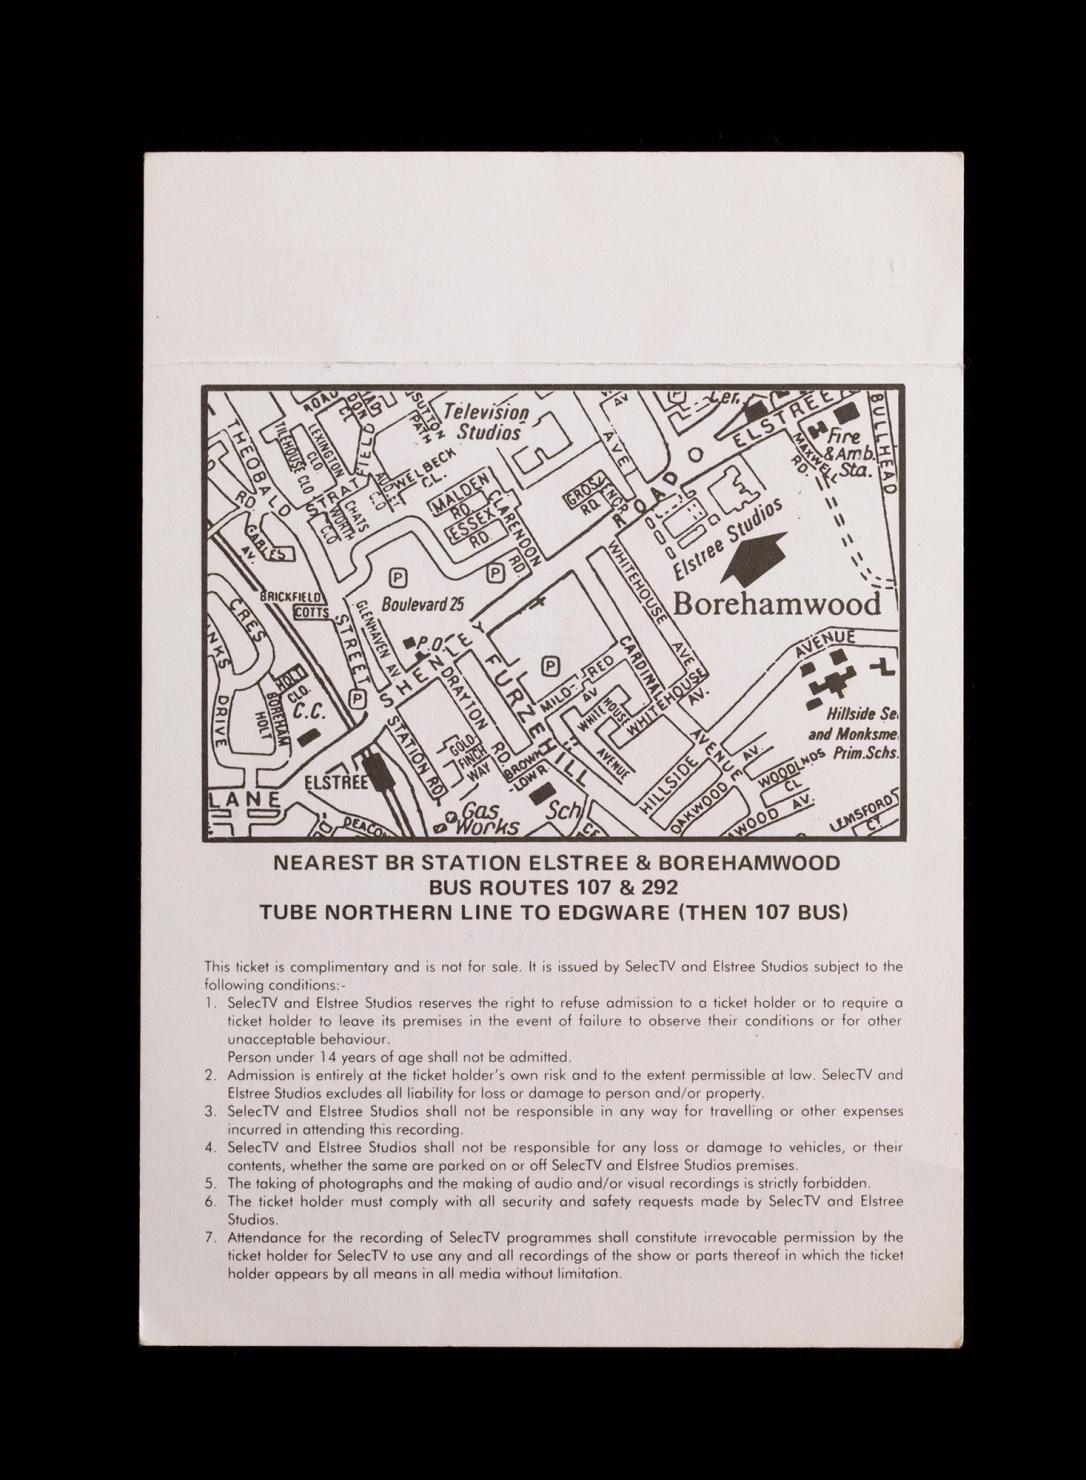 rik-mayall-1992-london-2-2k